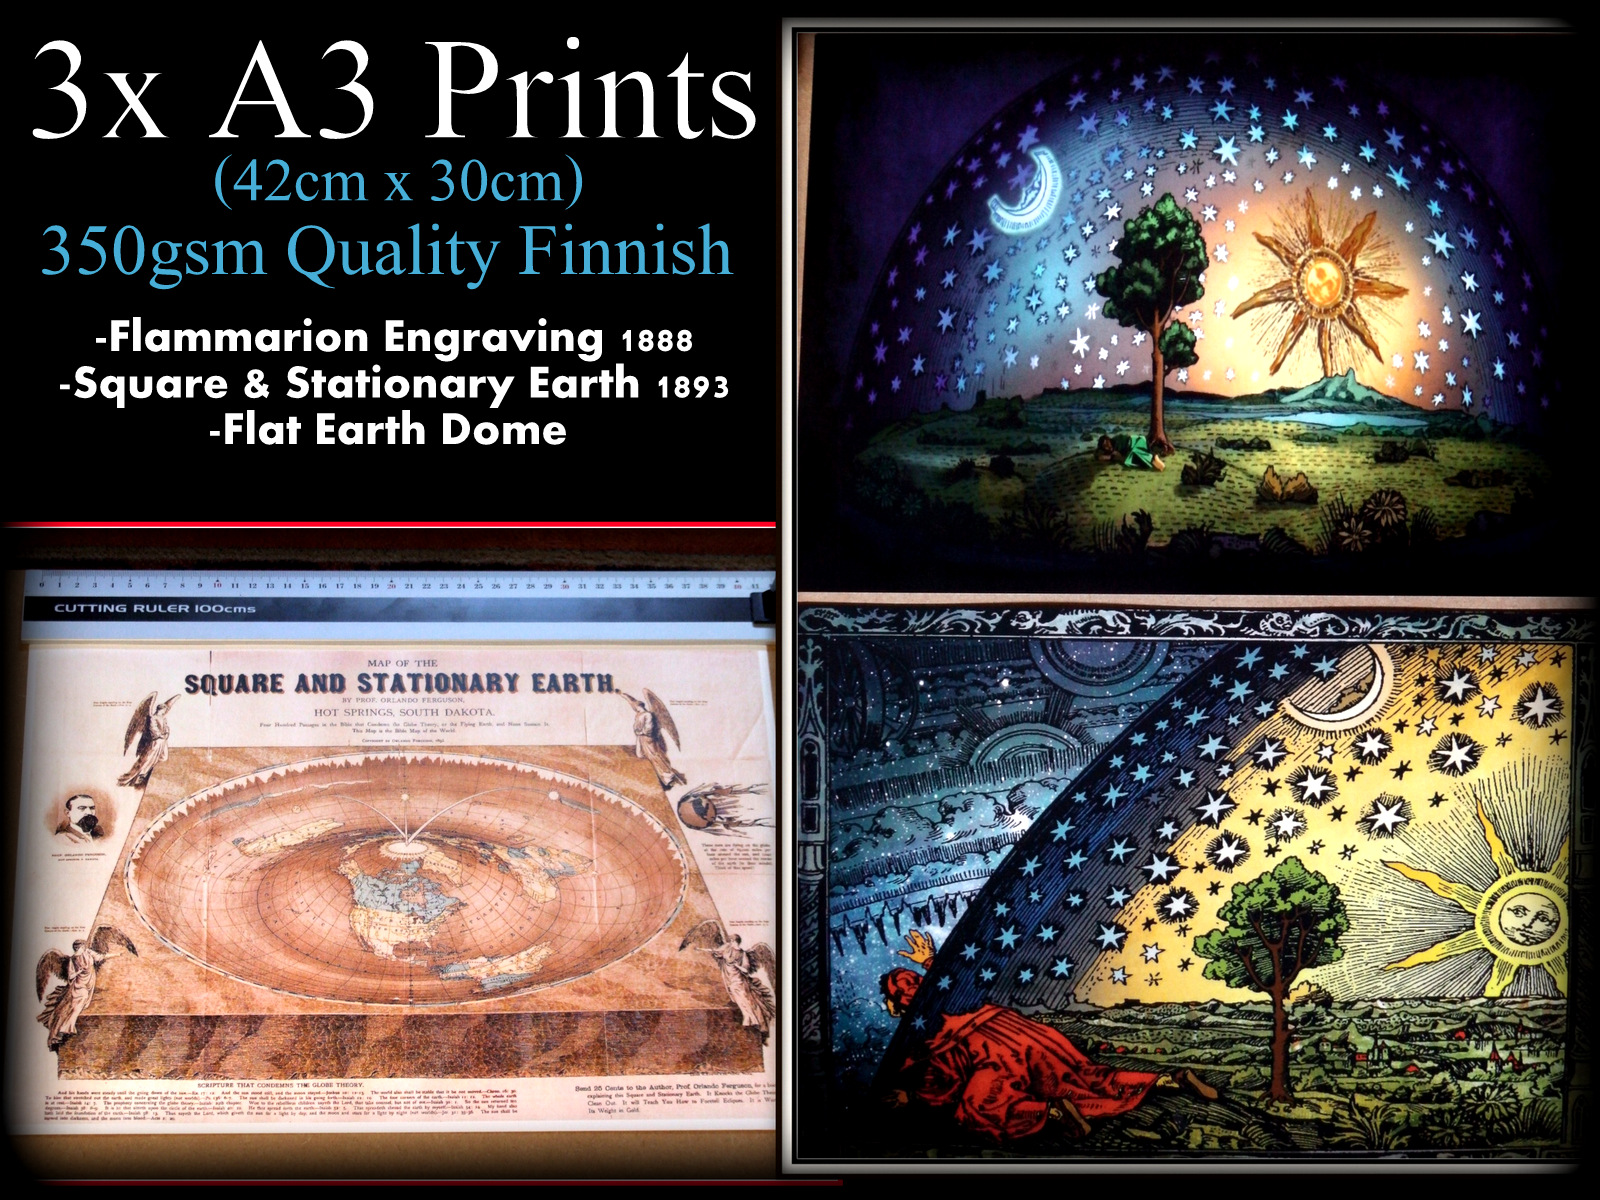 3X FLAT EARTH PRINT #4